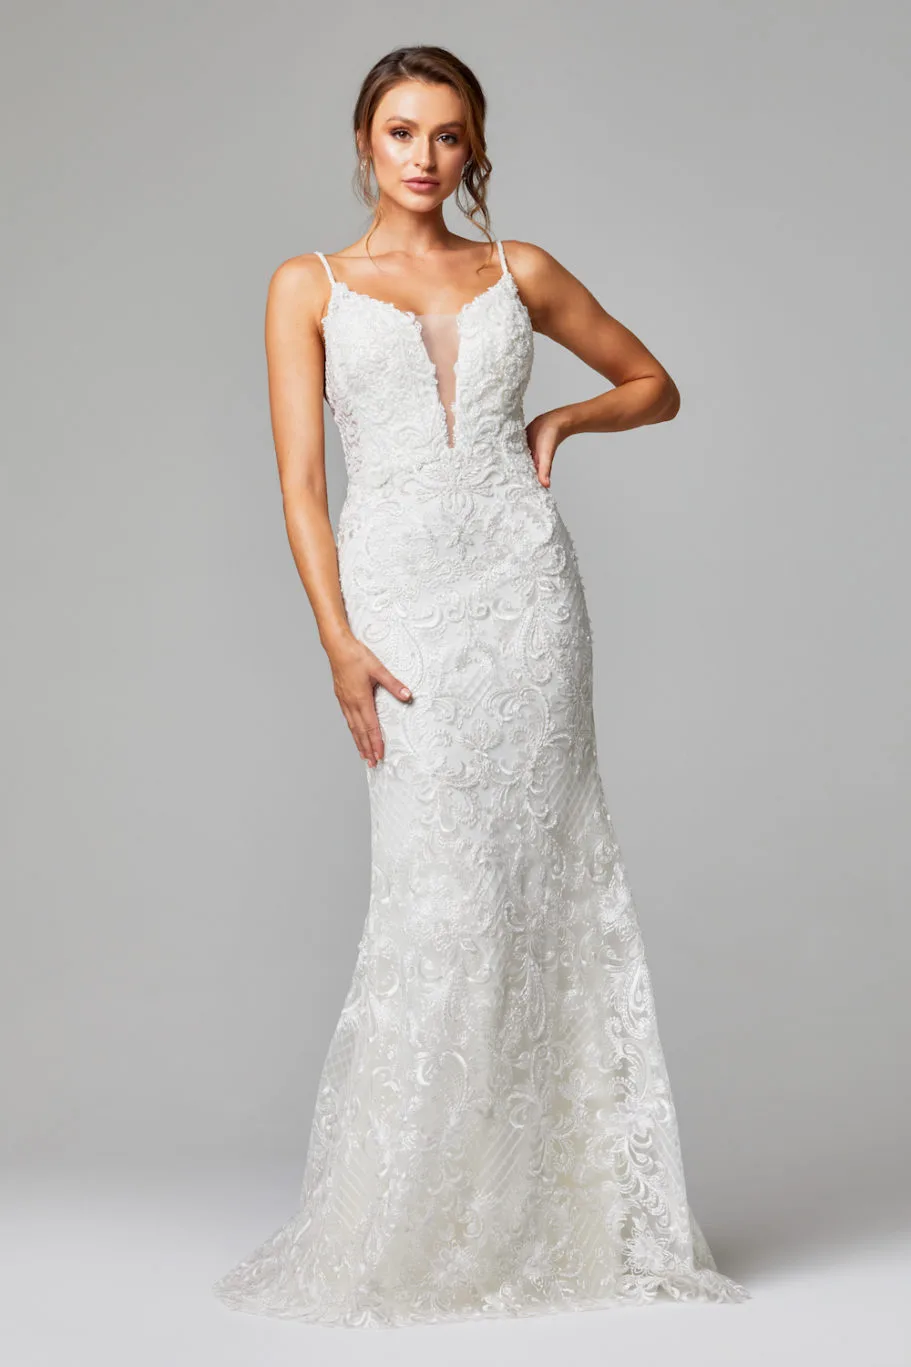 Shiloh Wedding Dress by Tania Olsen - Vintage White